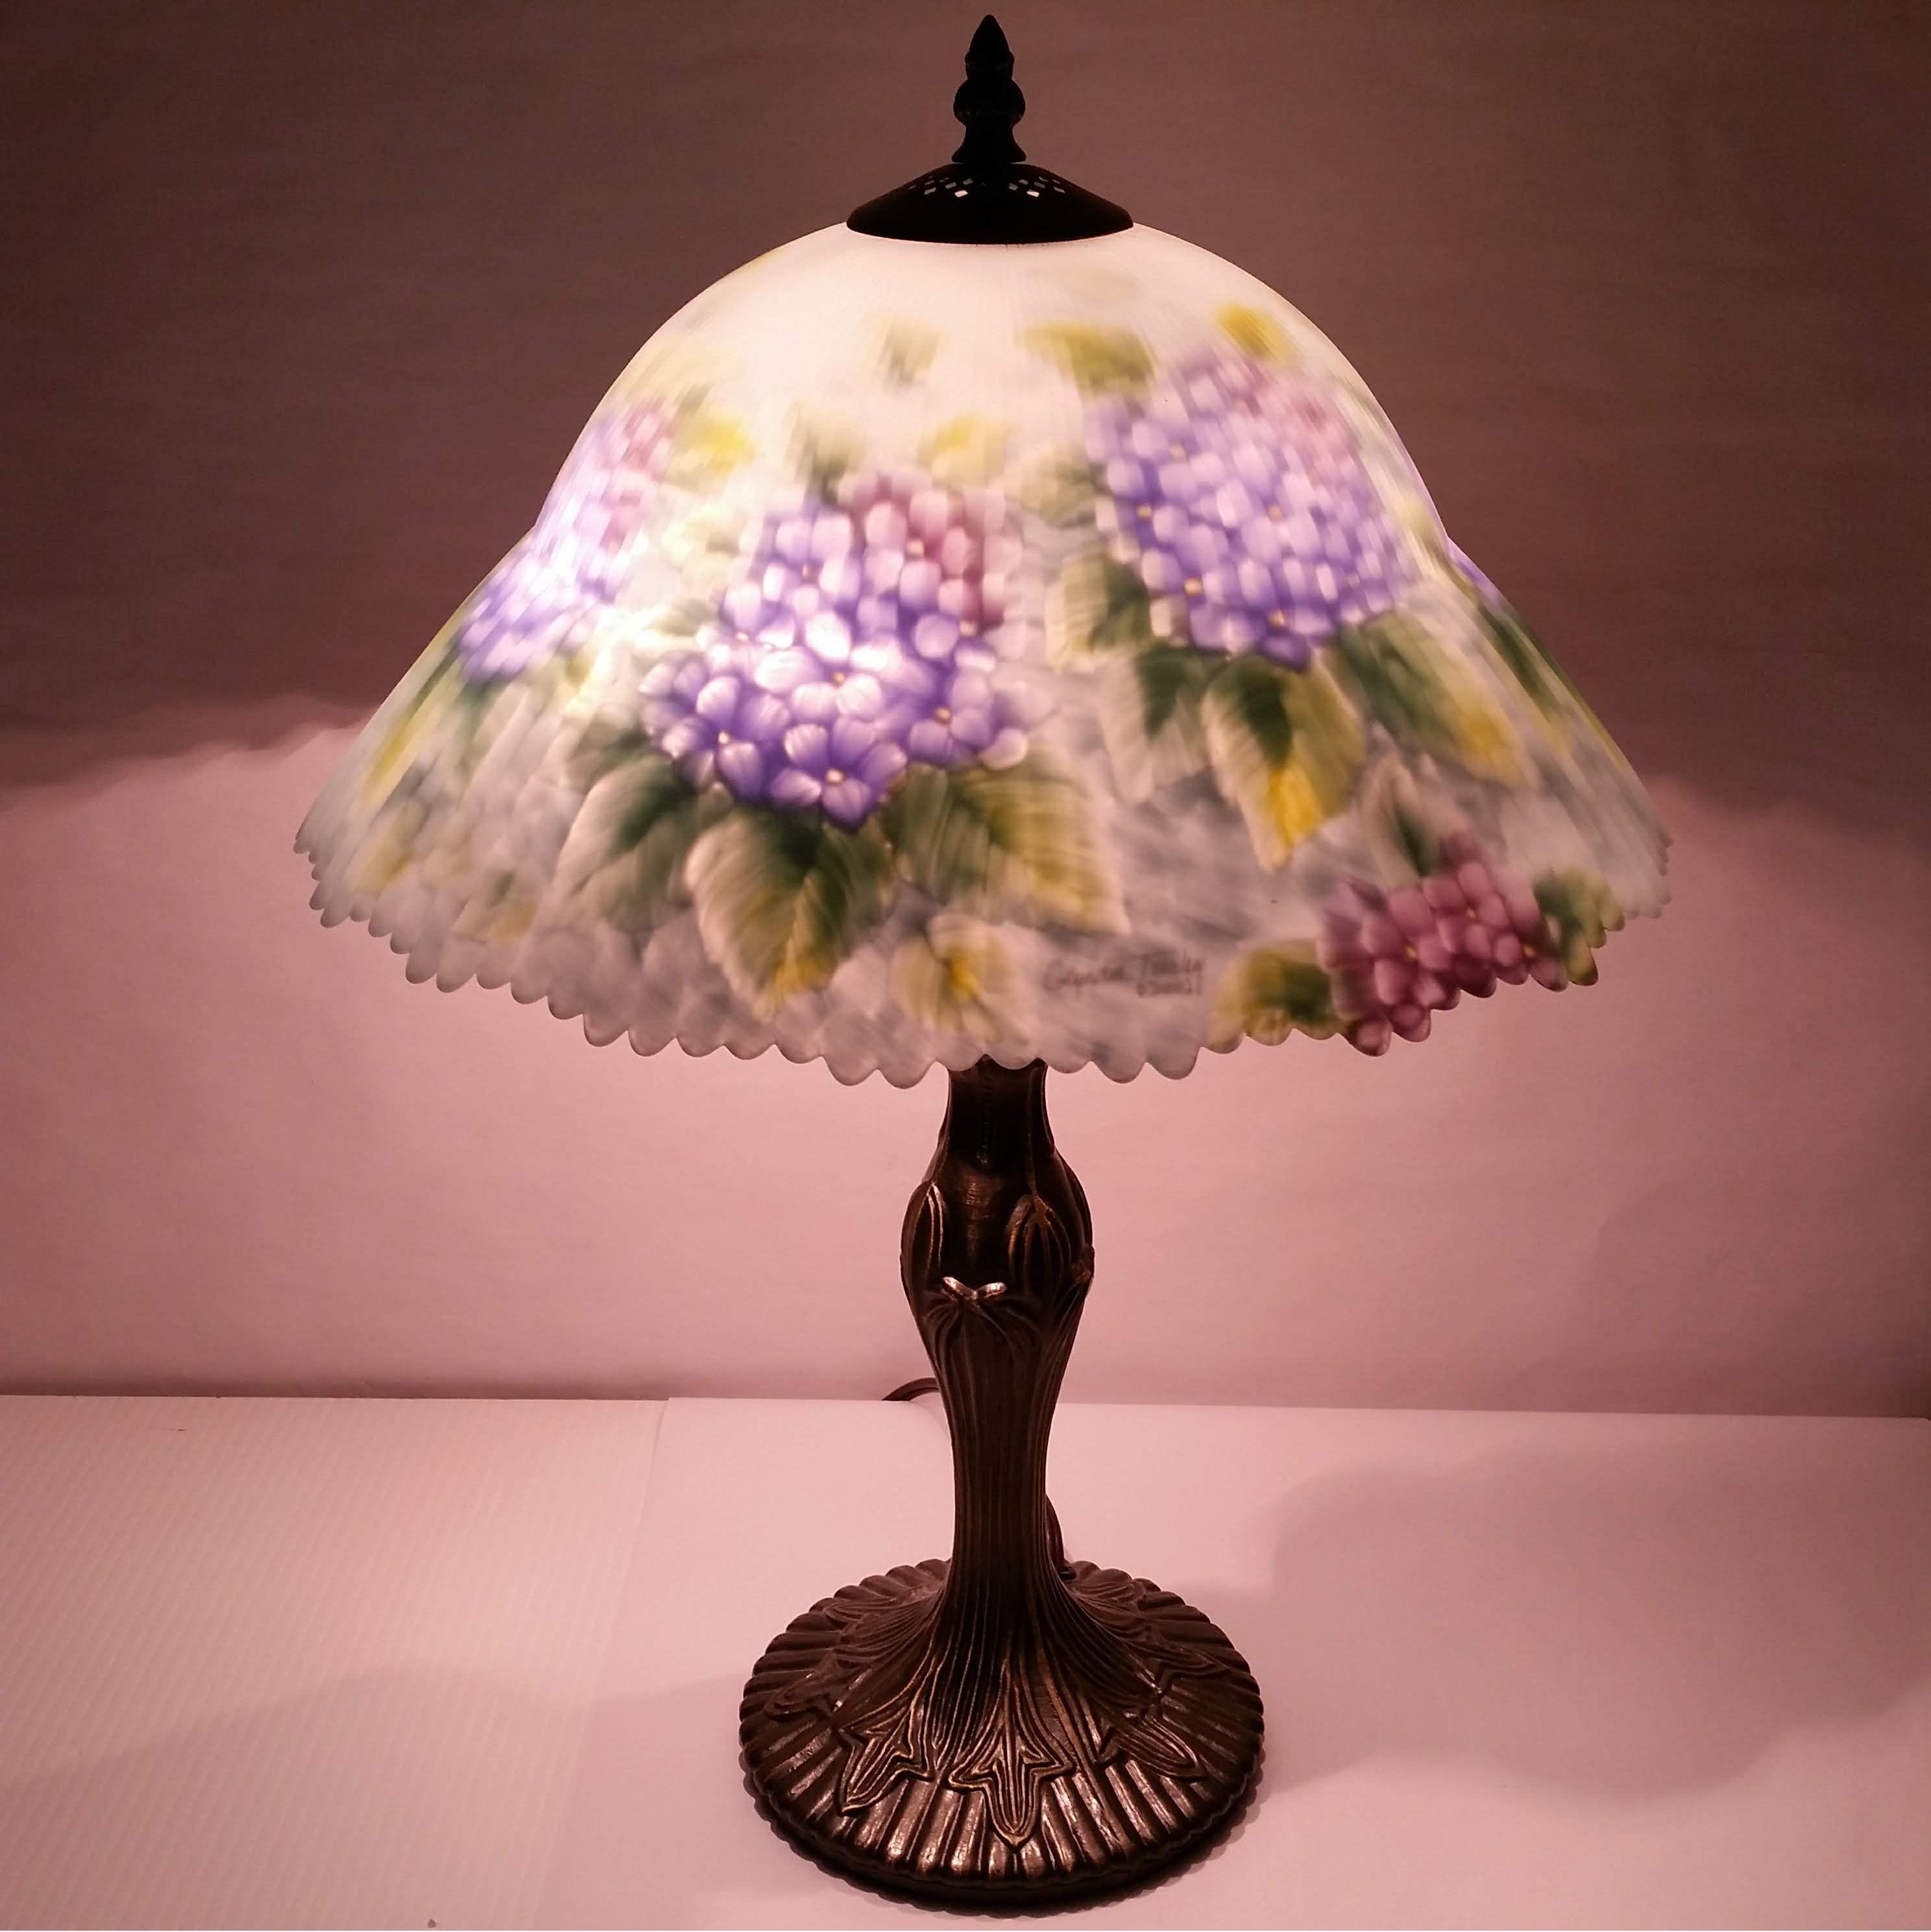 Sold Tiffany Lamp Glynda Turley Reverse Painted Hydrangea Glass